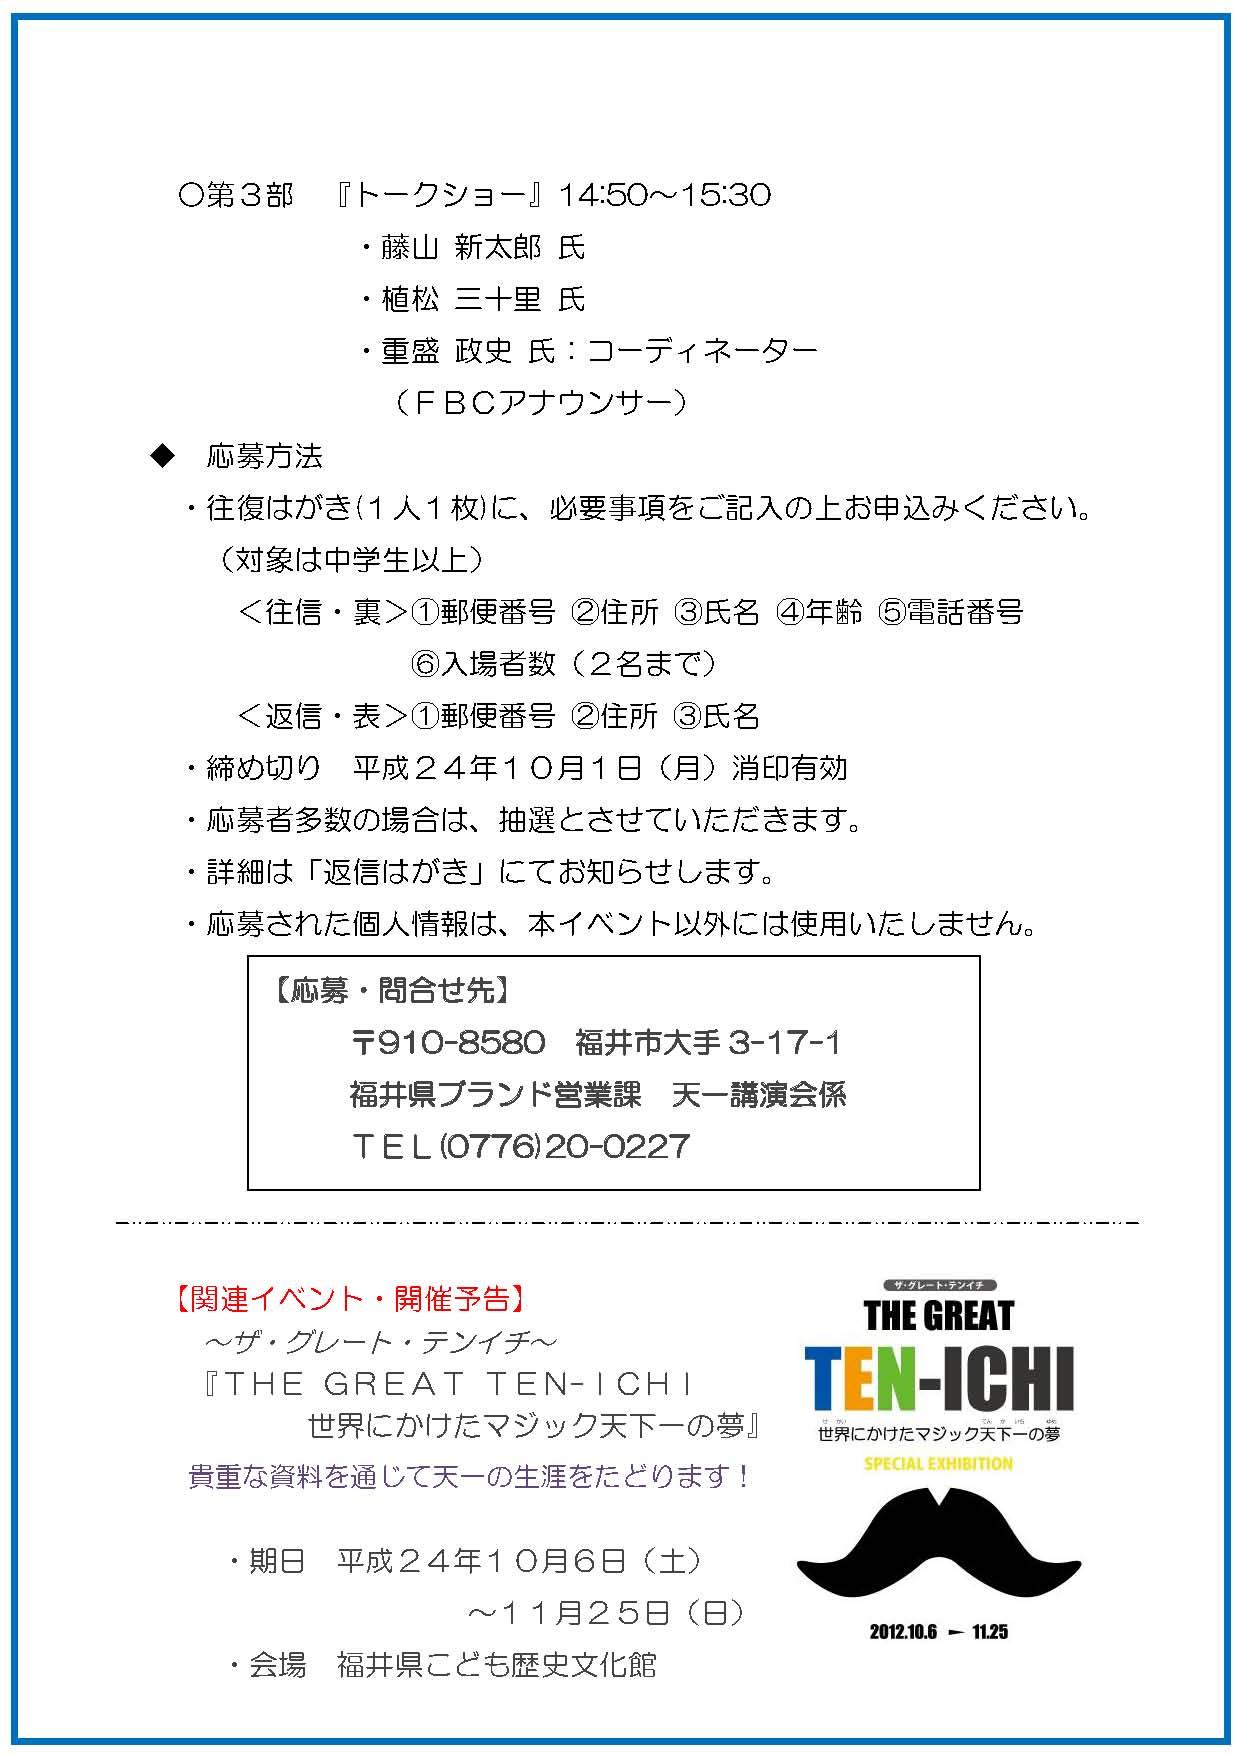 松旭斎天一没後100周年記念イベント!_f0229508_16102375.jpg